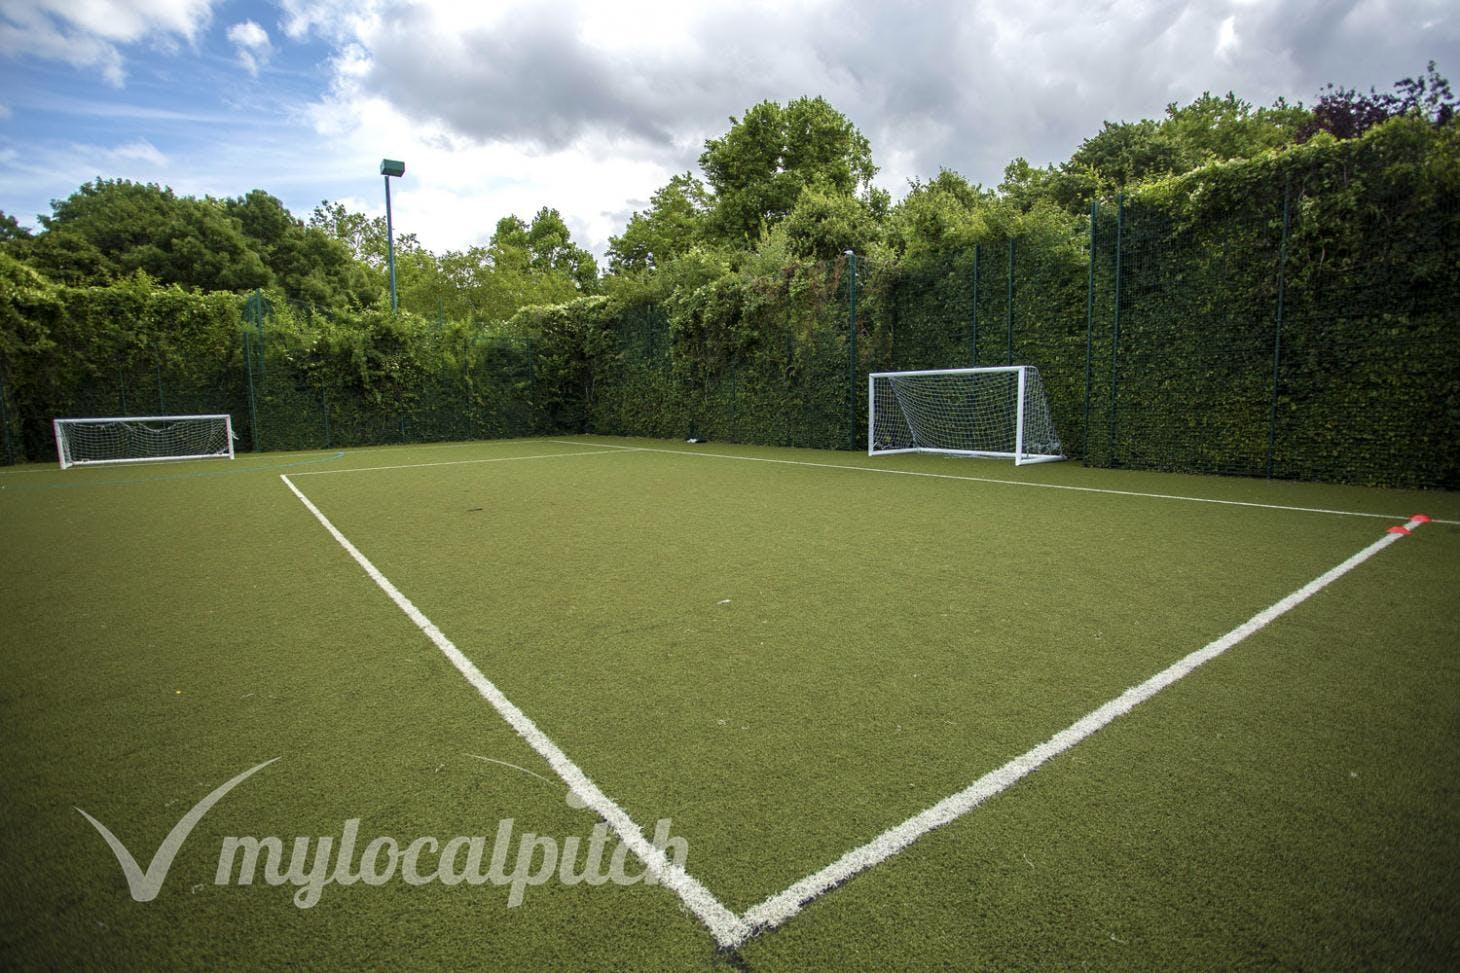 Paddington Recreation Ground 7 a side | 3G Astroturf football pitch